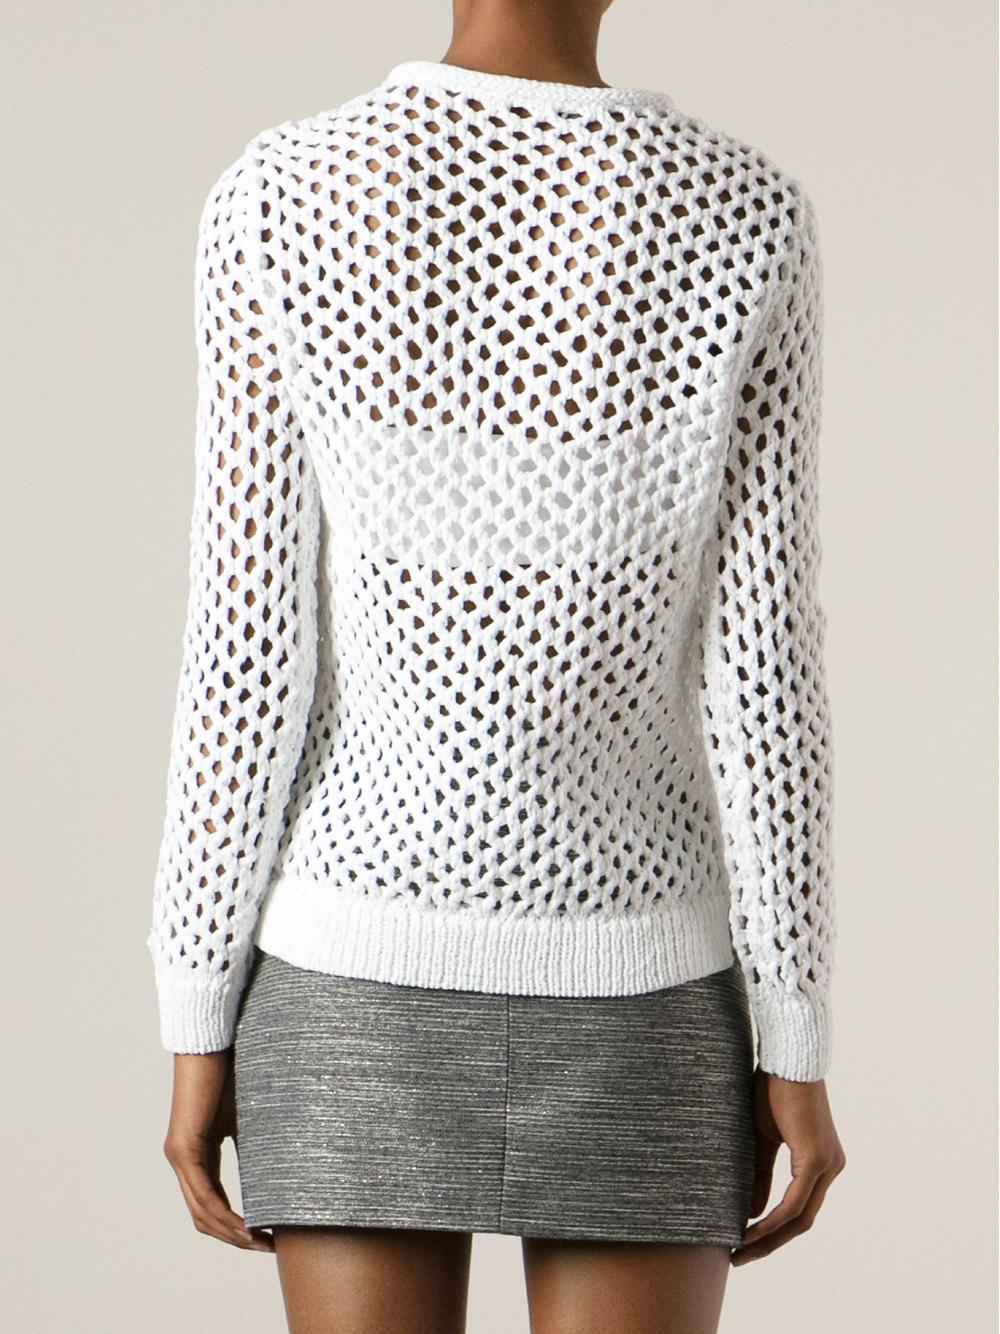 T by alexander wang Open-knit Sweater in White | Lyst